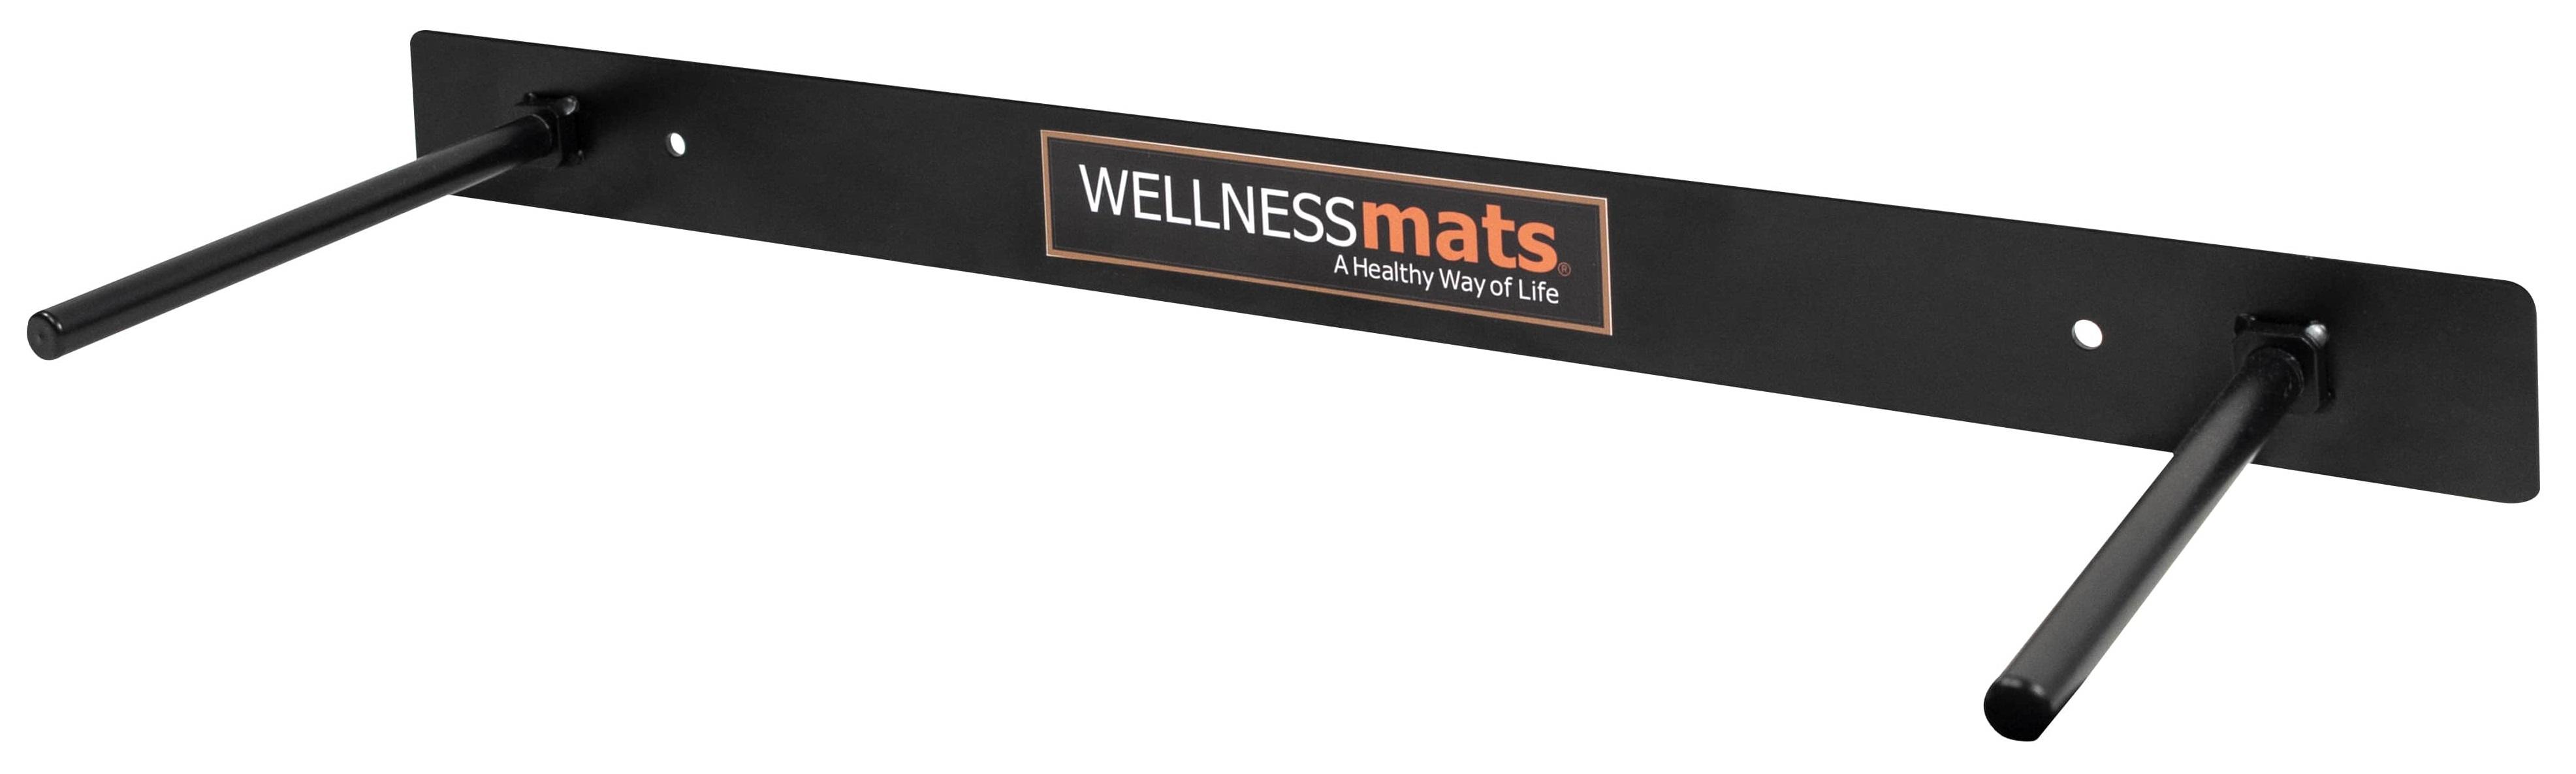 FitnessMat Wall Mounted Bracket